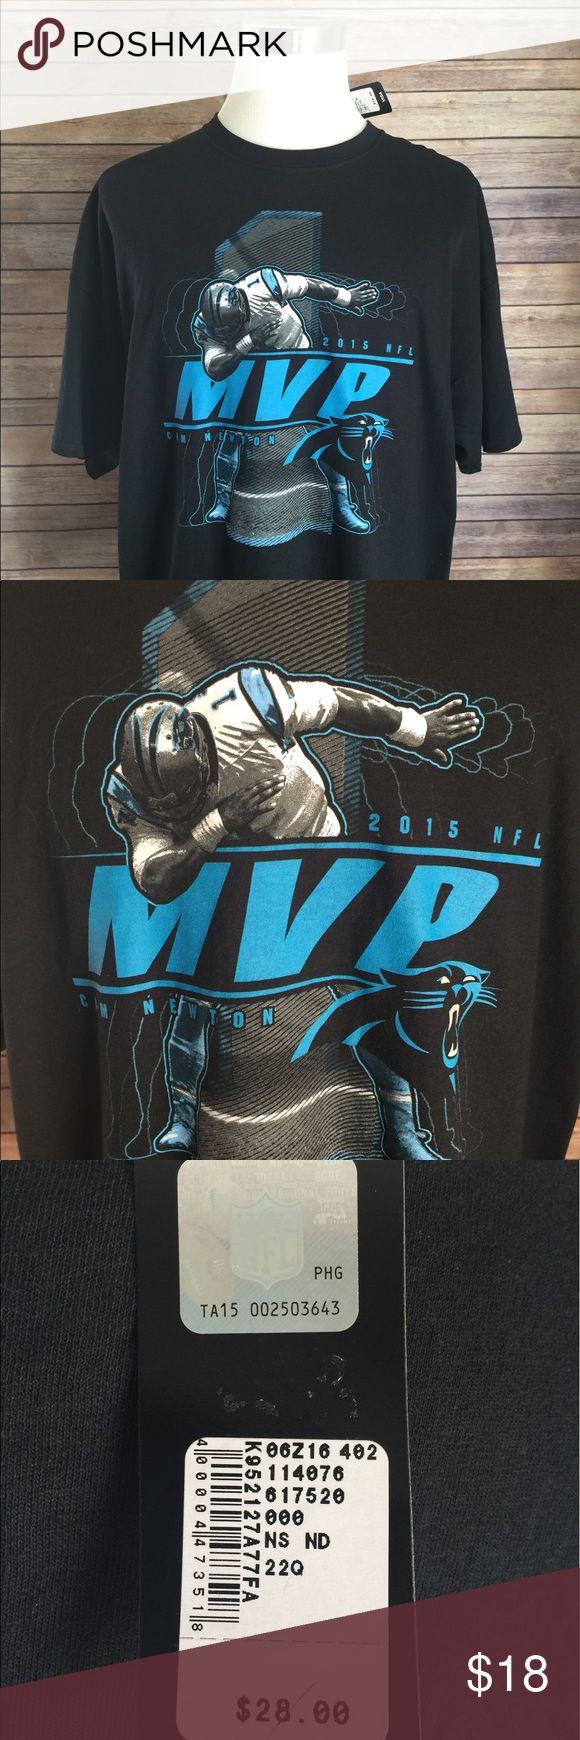 Cam Newton NFL 2015 MVP T-Shirt Cam Newton 🏈 2015 NFL MVP Black T-Shirt ...New With Tags ..Size 2XL ..100% Cotton Shirts Tees - Short Sleeve